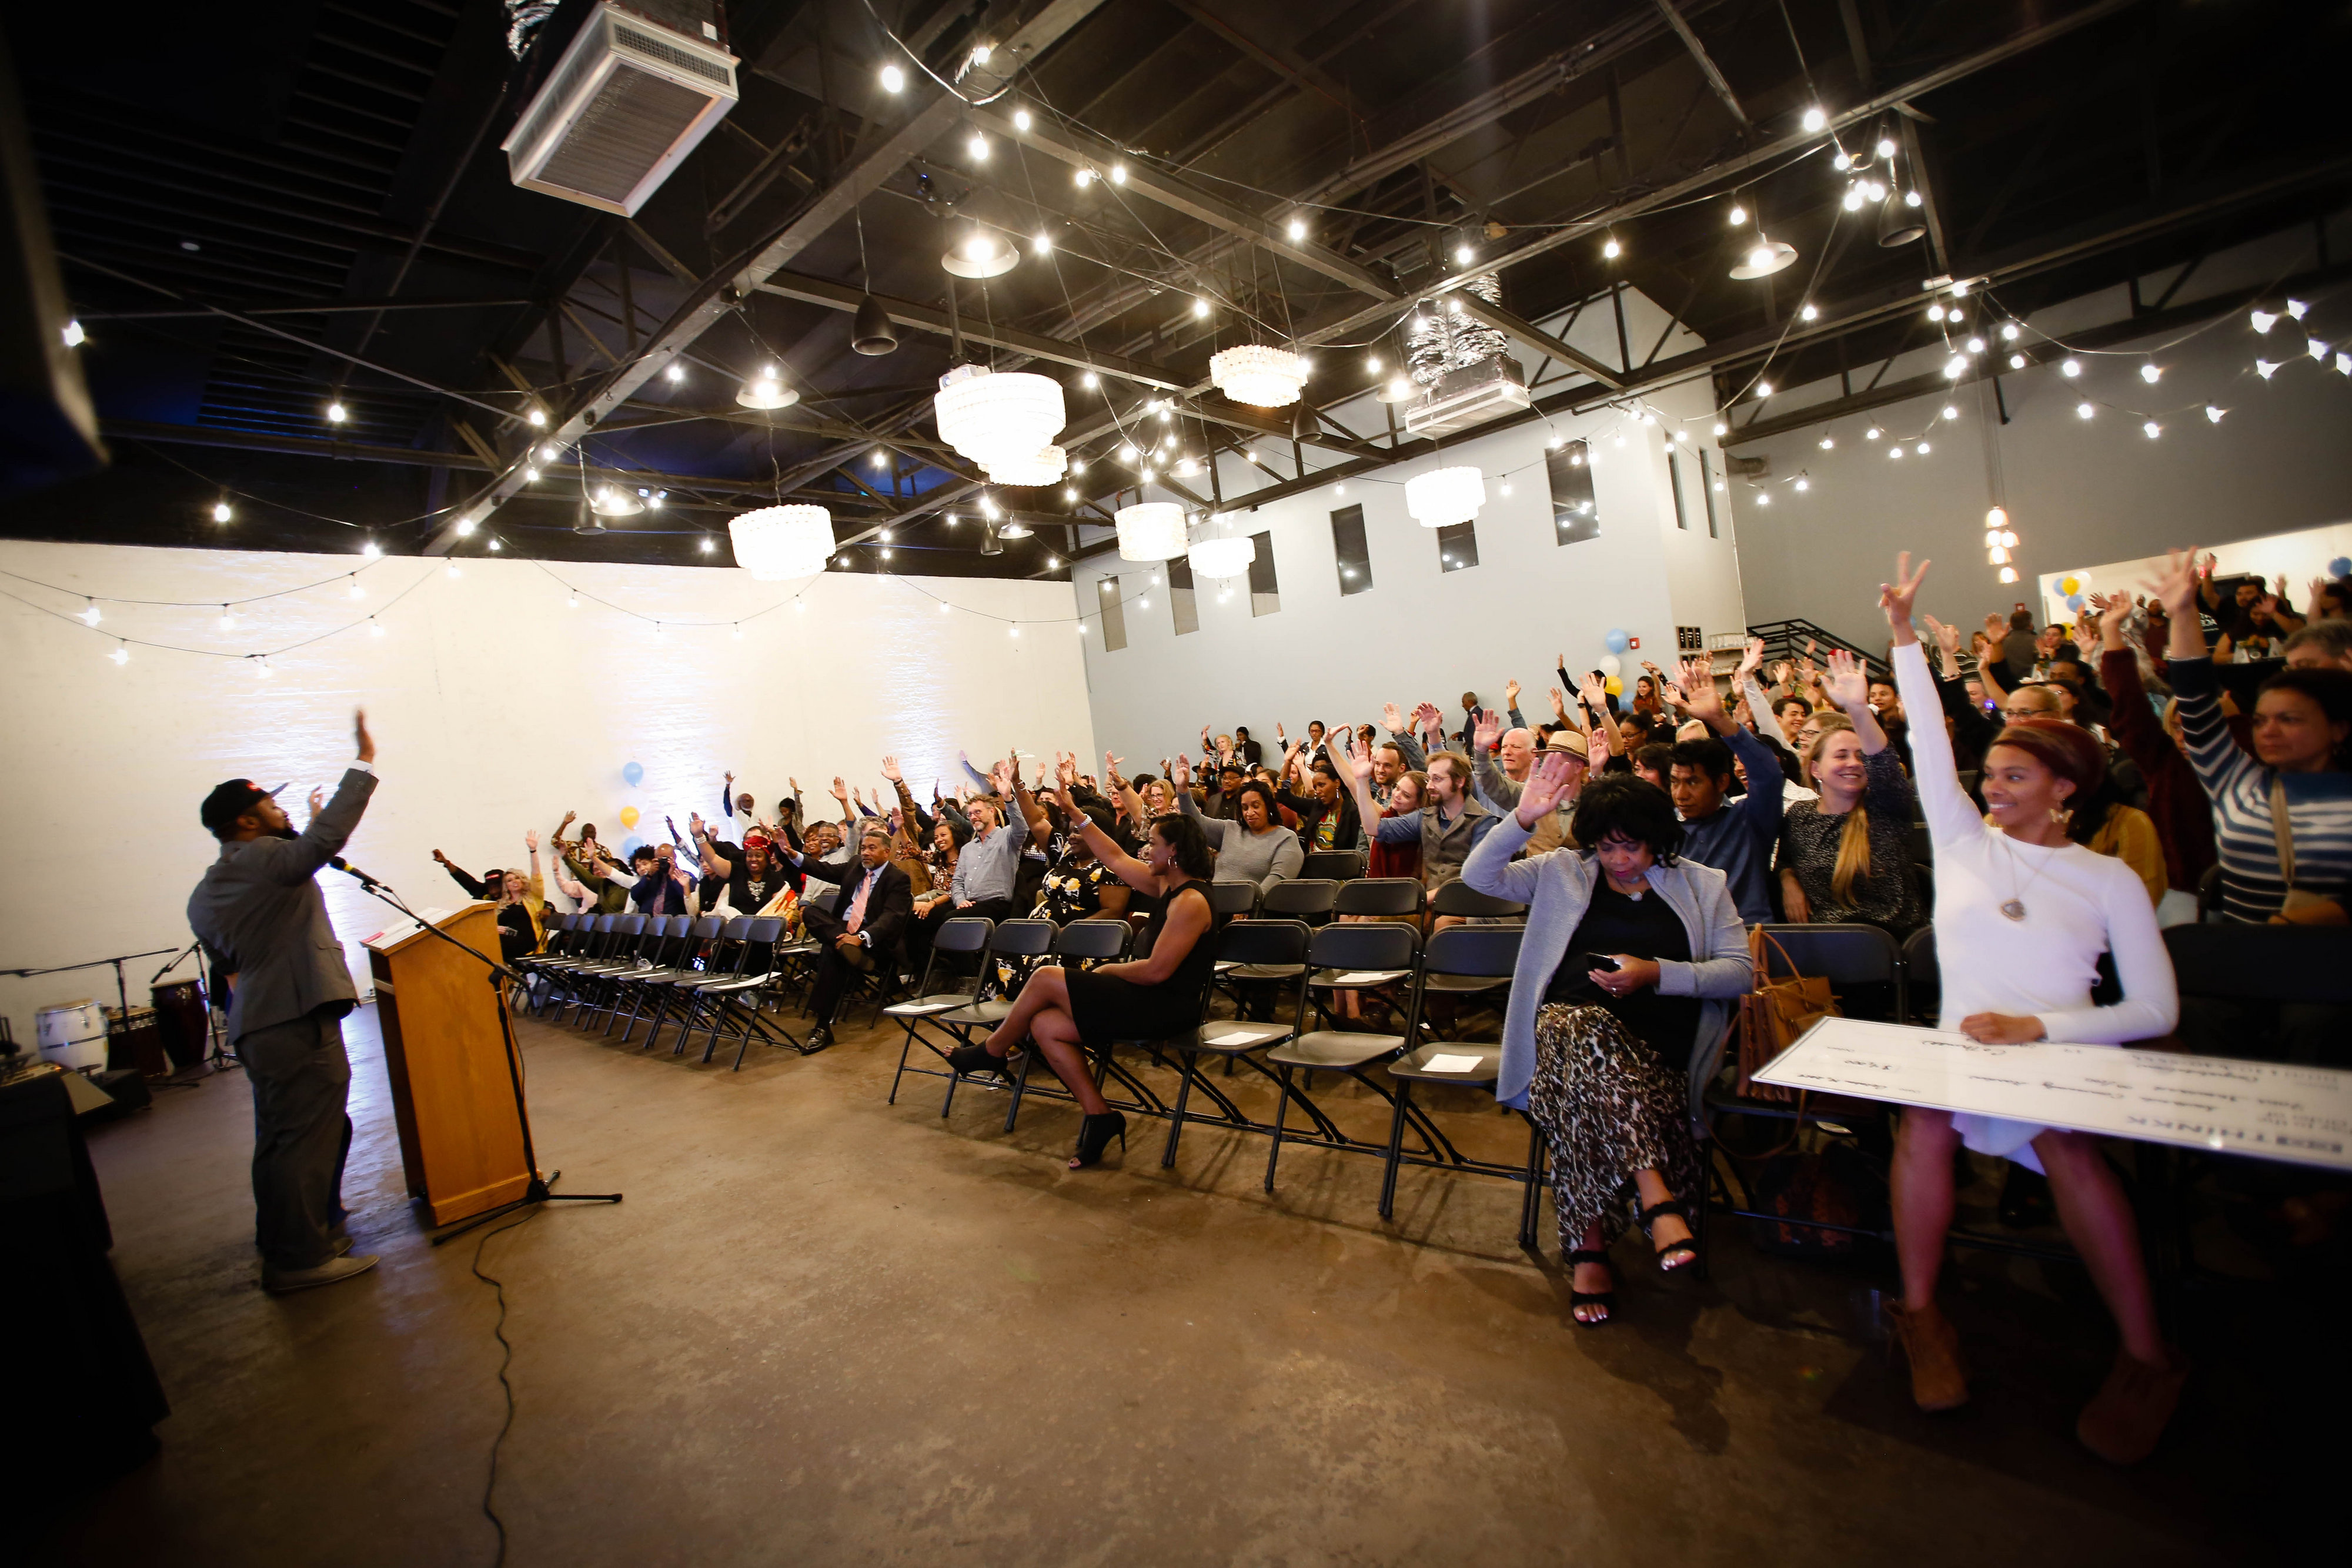 View More: https://arielshumakerphotography.pass.us/cothinkk-awards-10-19